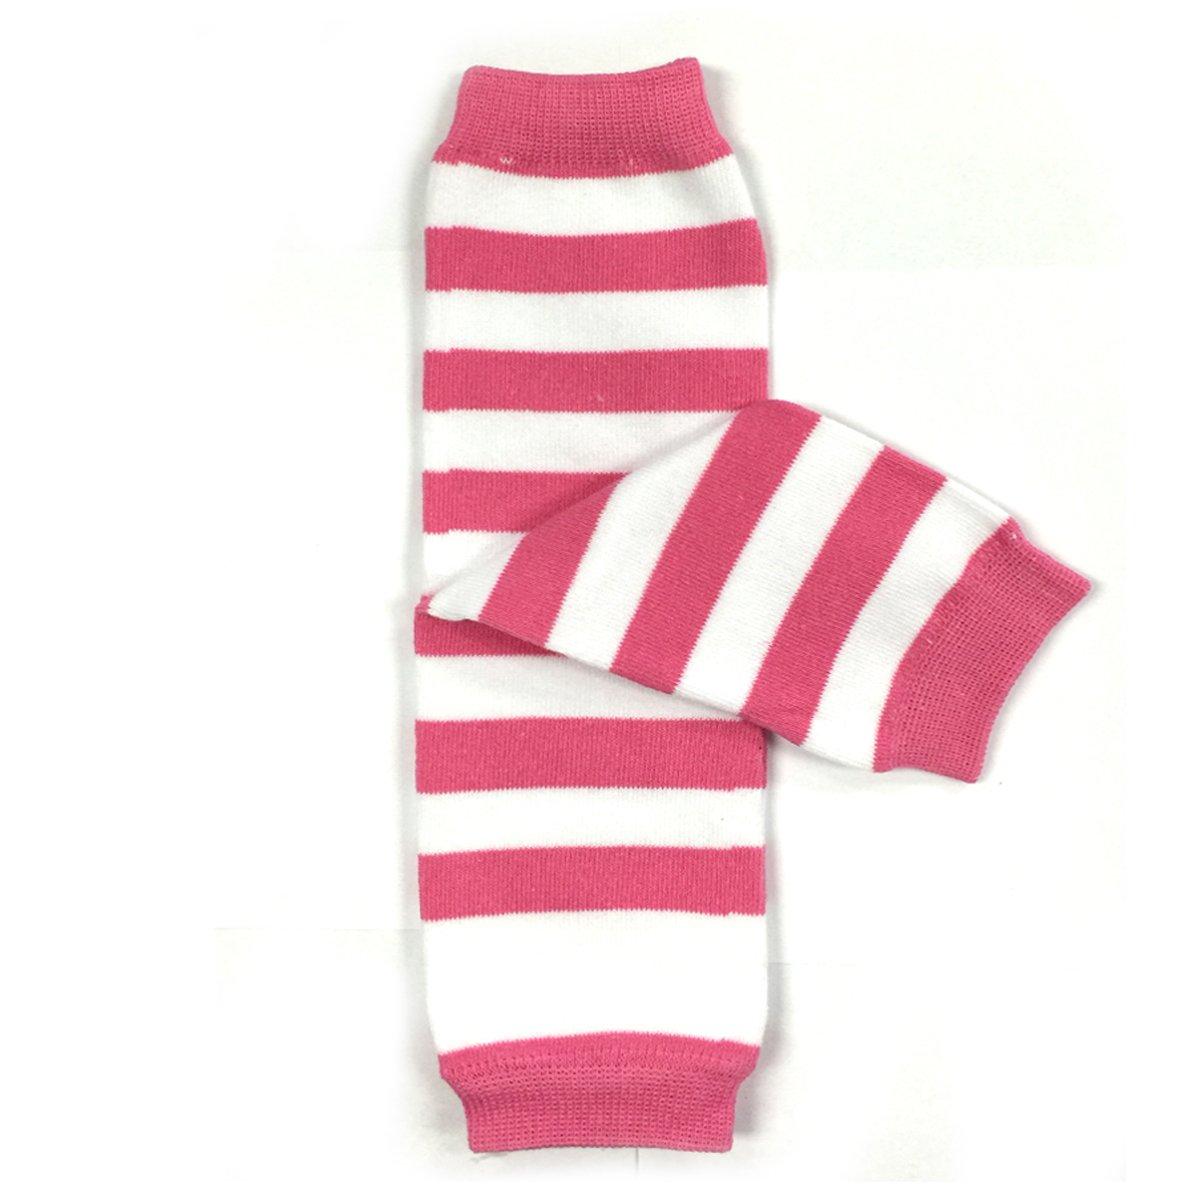 Bowbear Baby Stripes and Chevron Leg Warmers